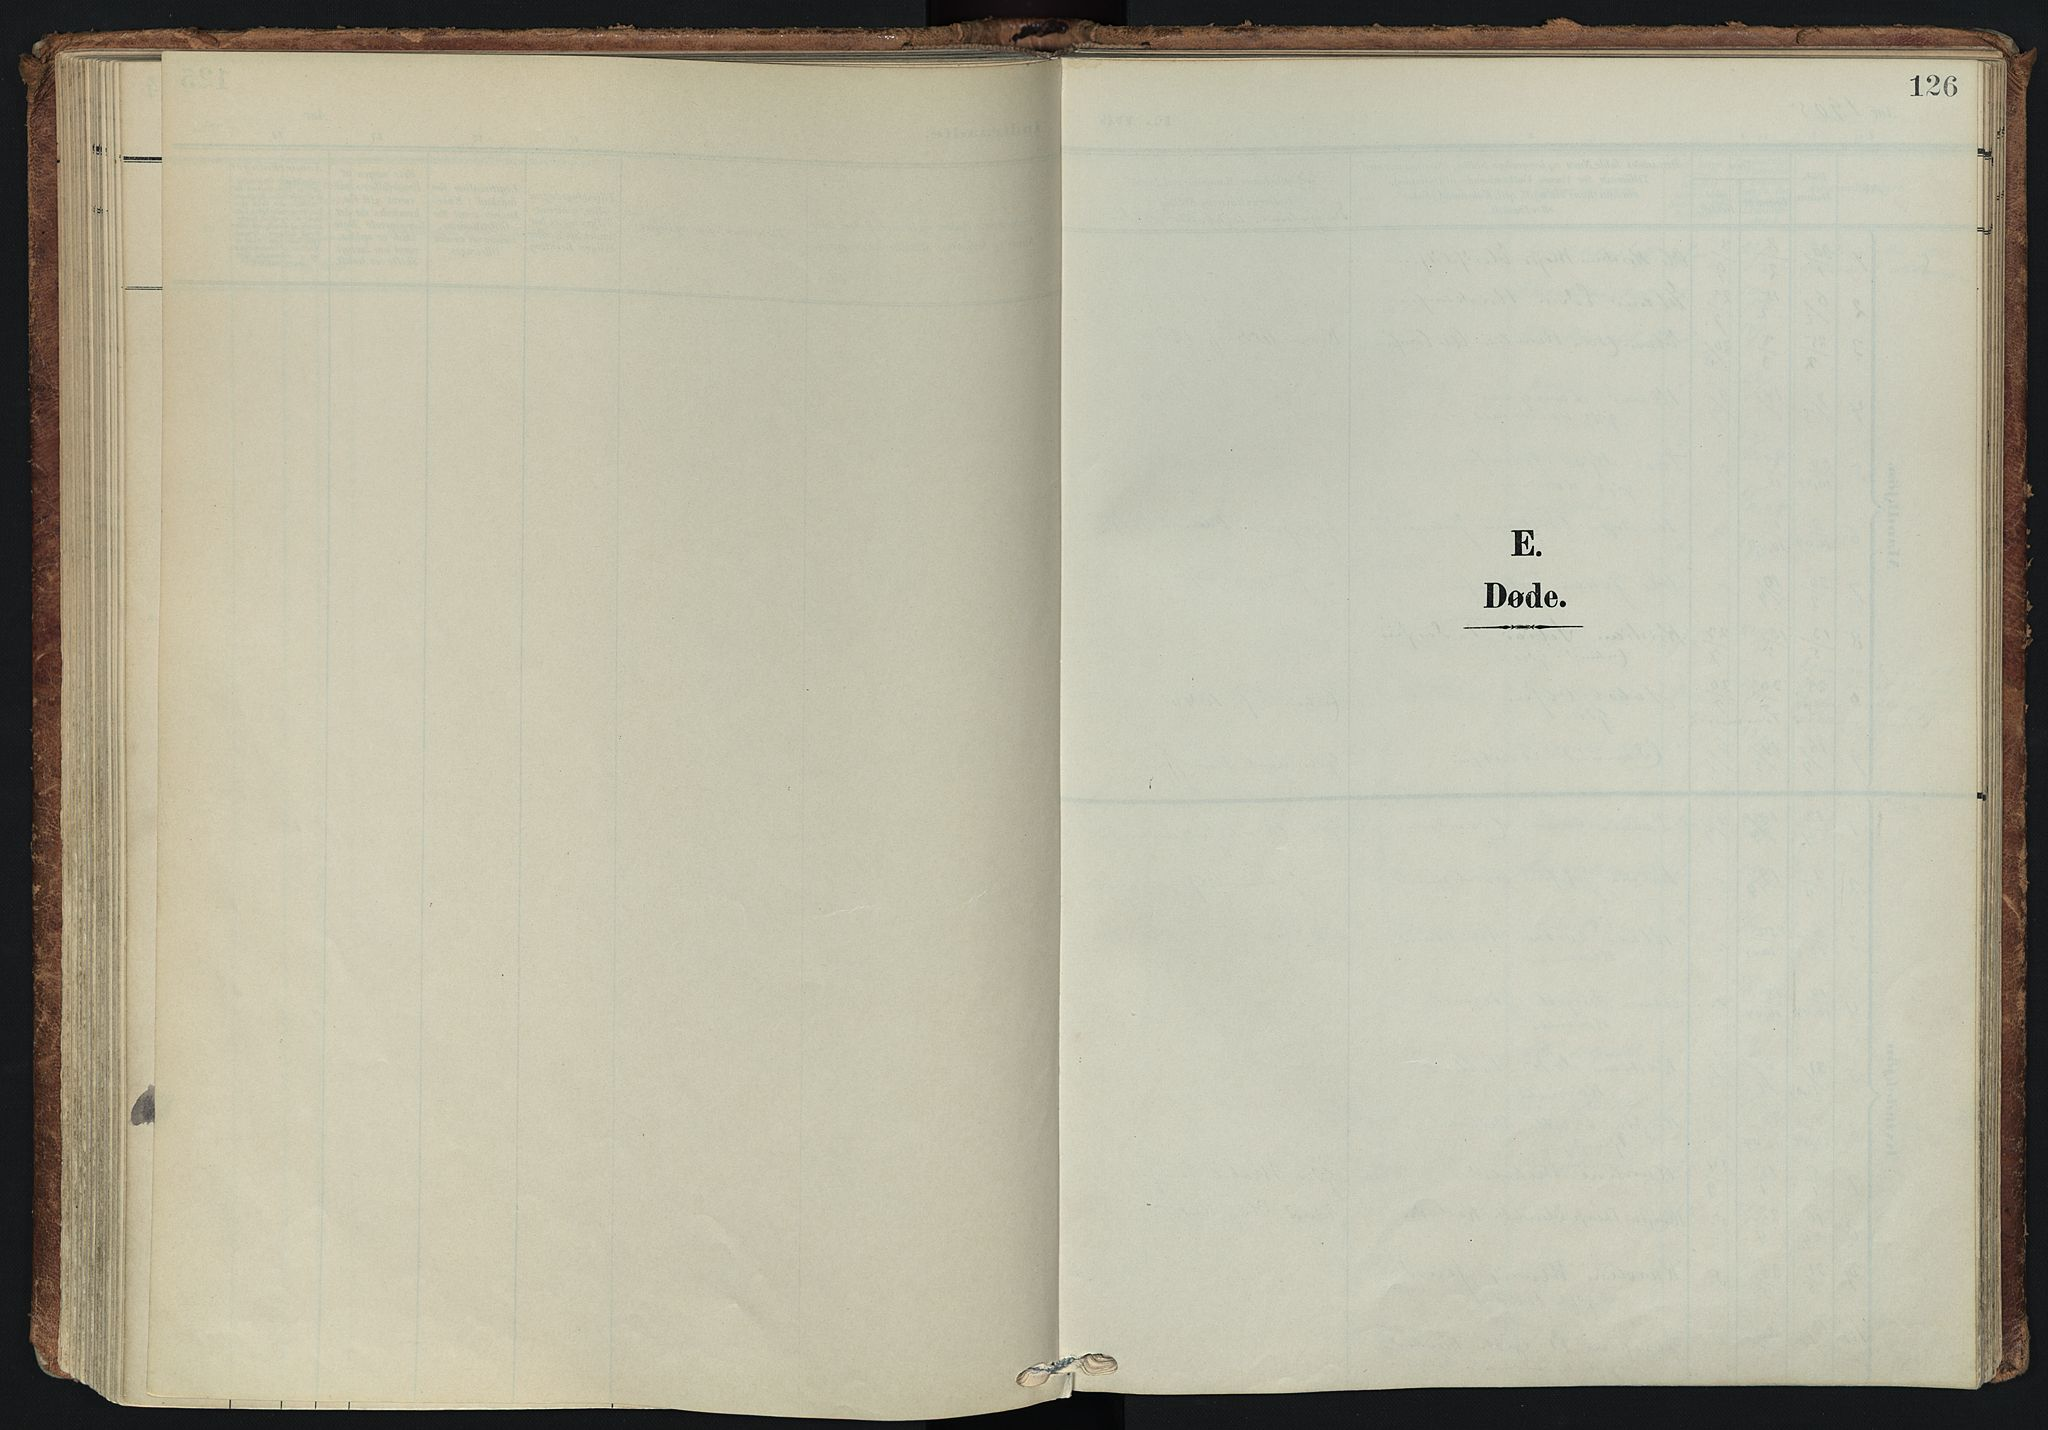 SATØ, Tranøy sokneprestkontor, I/Ia/Iaa/L0014kirke: Ministerialbok nr. 14, 1905-1919, s. 126